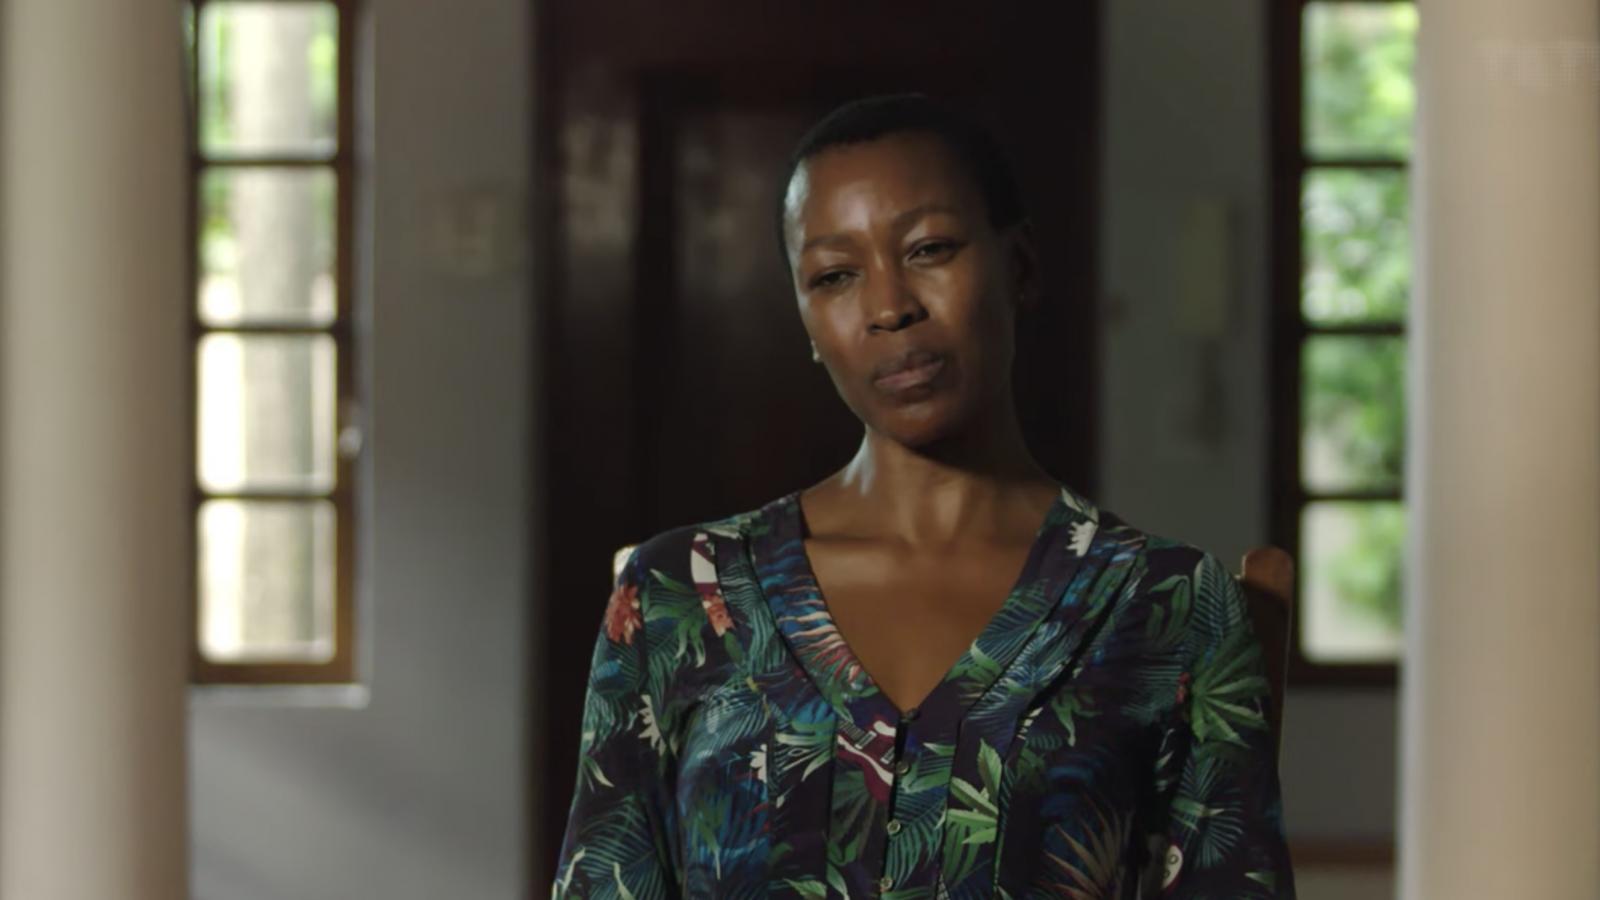 Artist Billie Zangewa – the Ultimate Act of Resistance is Self-Love, TateShots